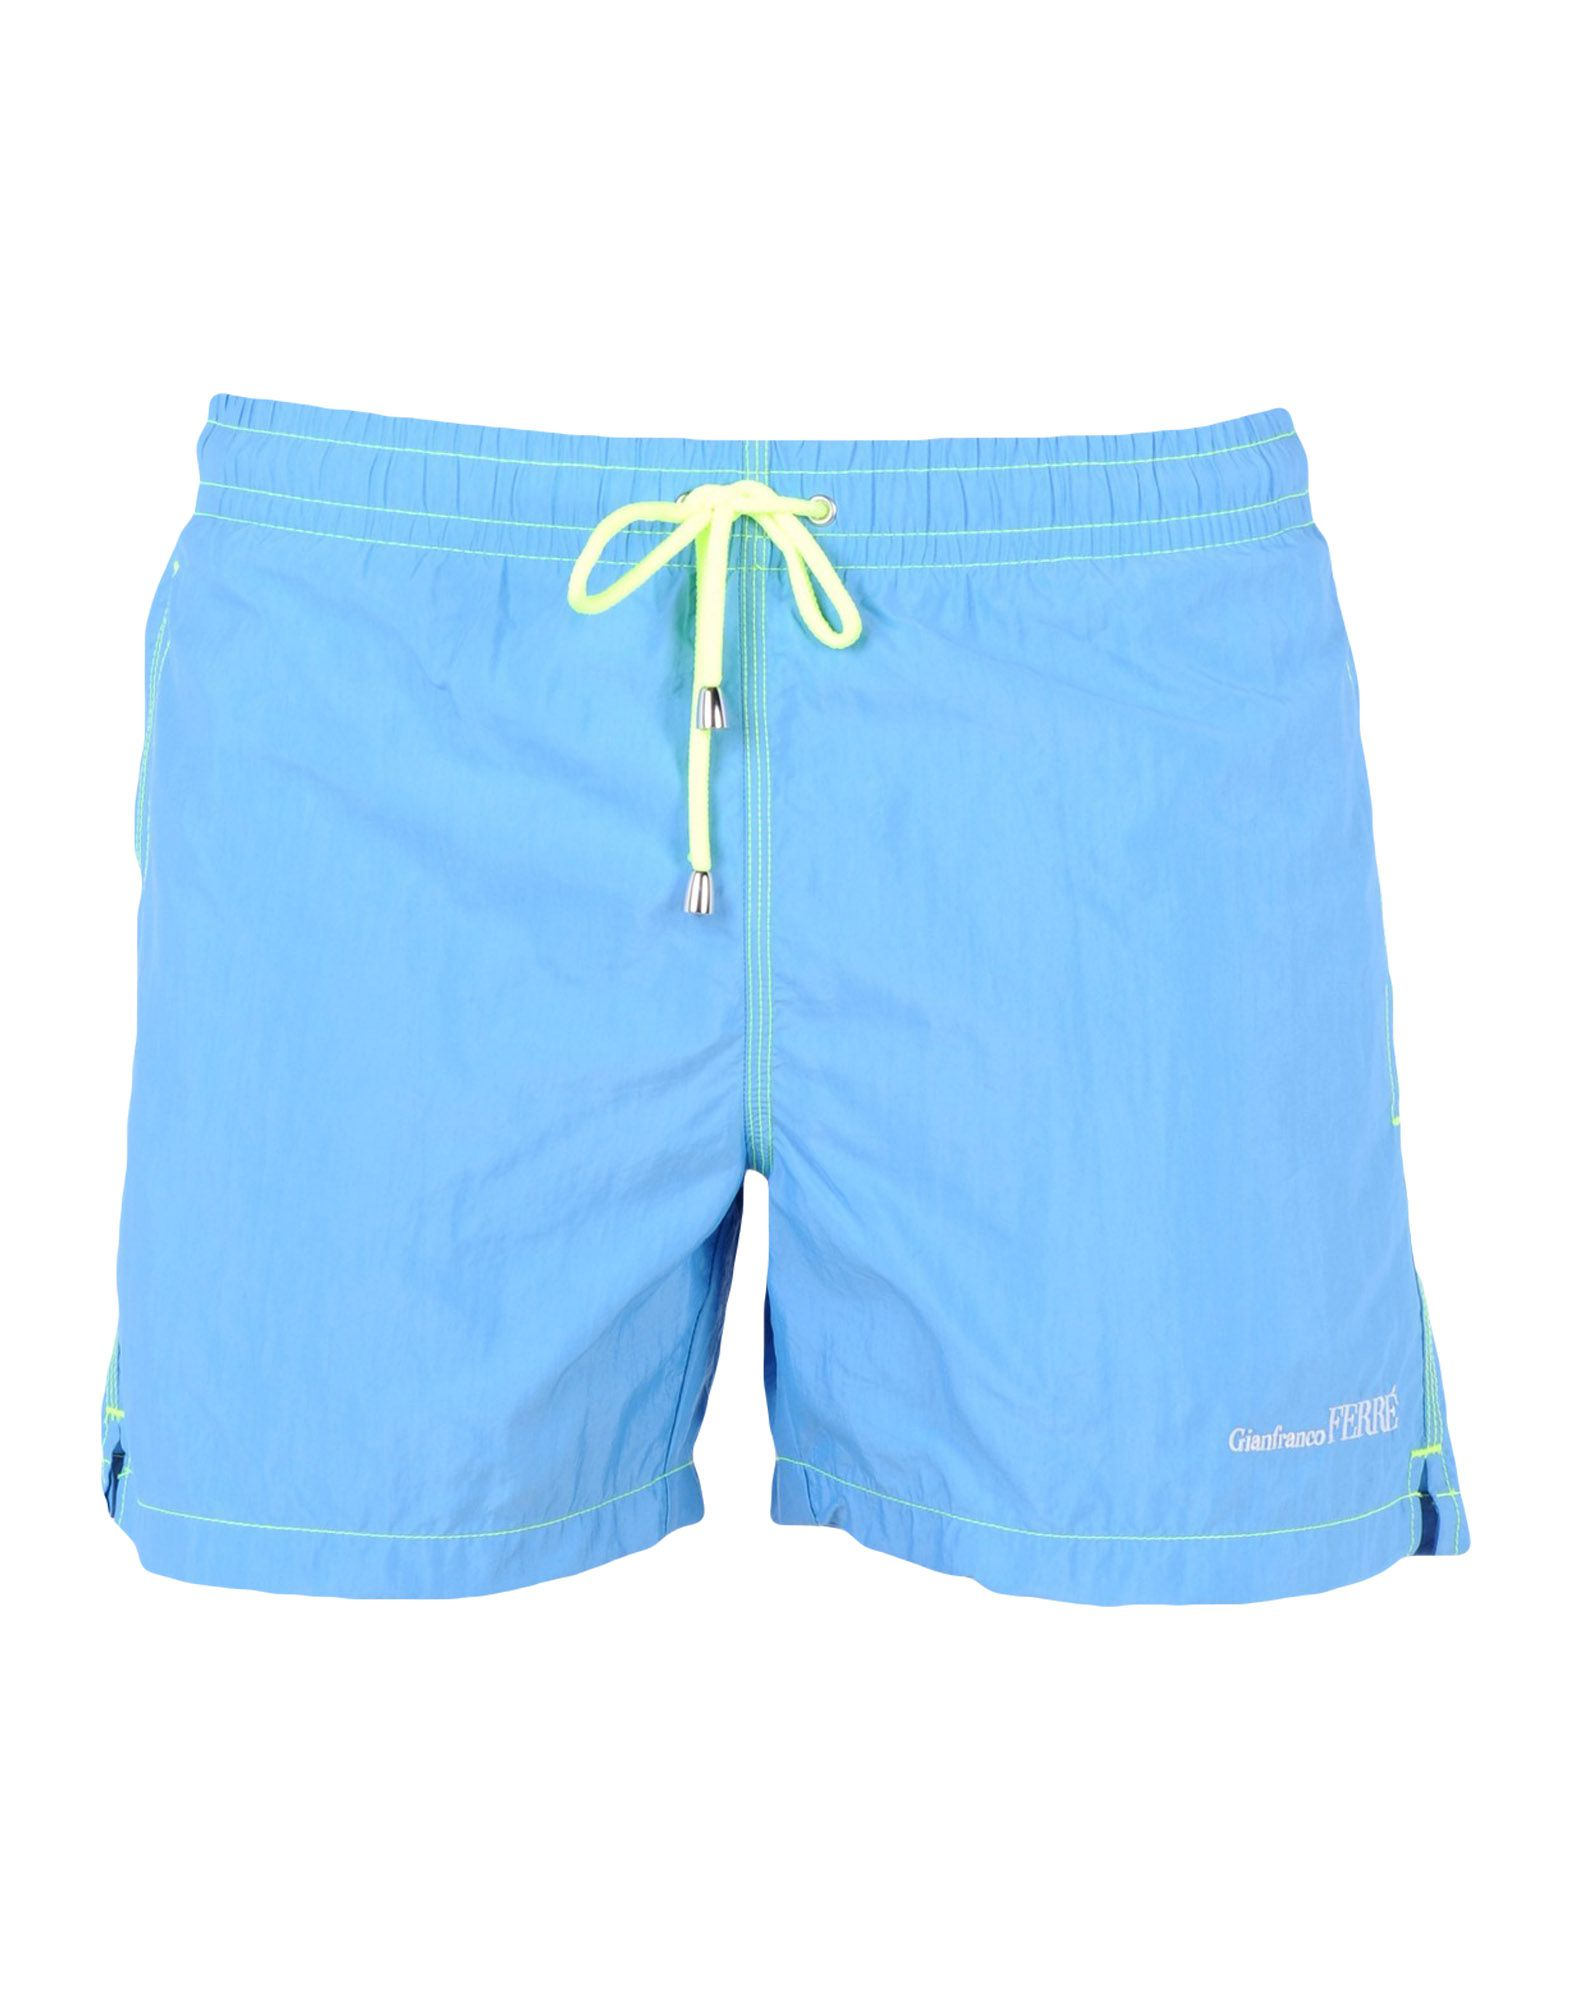 GIANFRANCO FERRE' BEACHWEAR Swim trunks